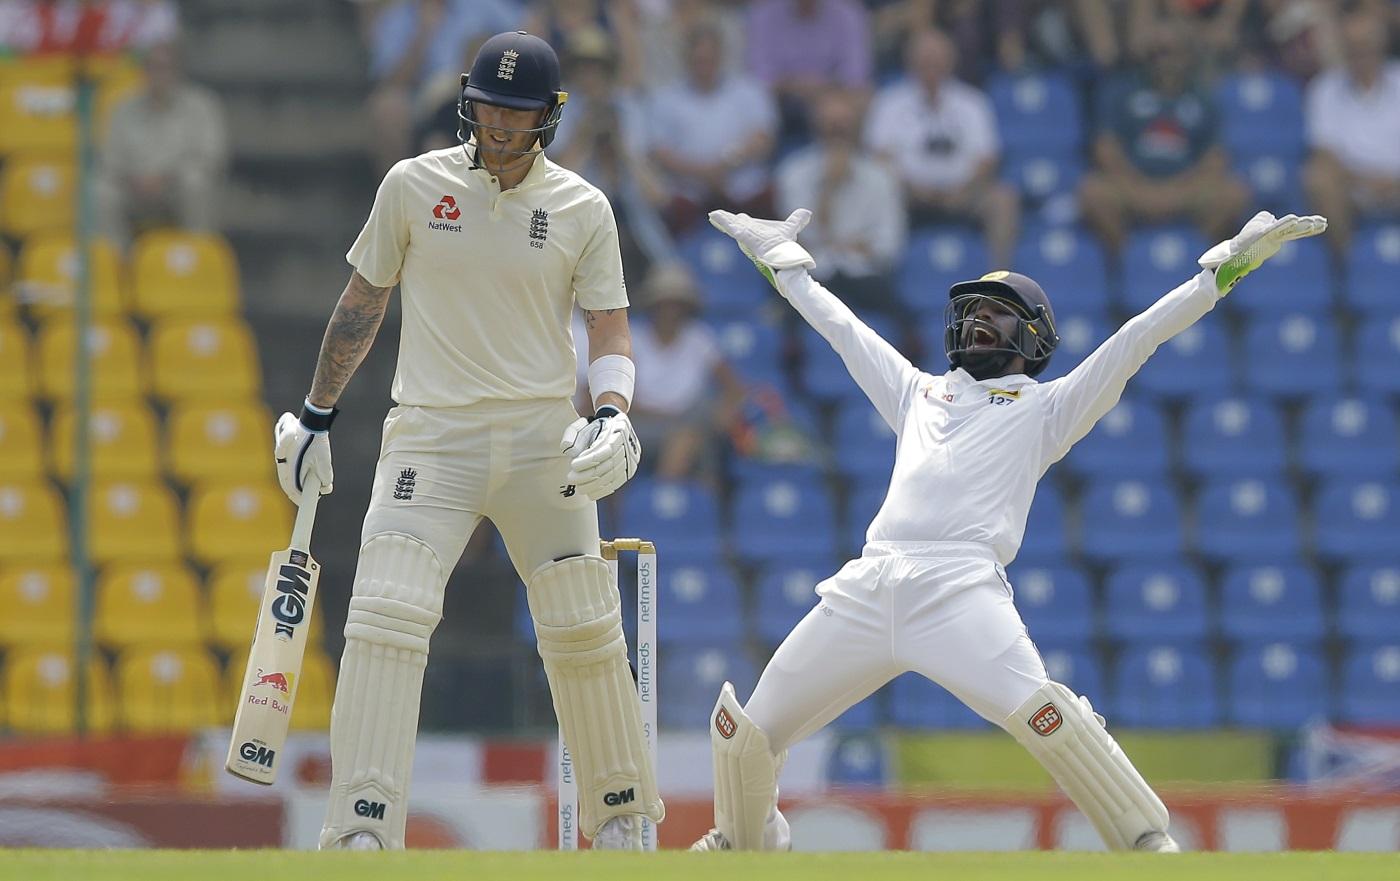 Sri Lanka vs England 2nd Test Day 1